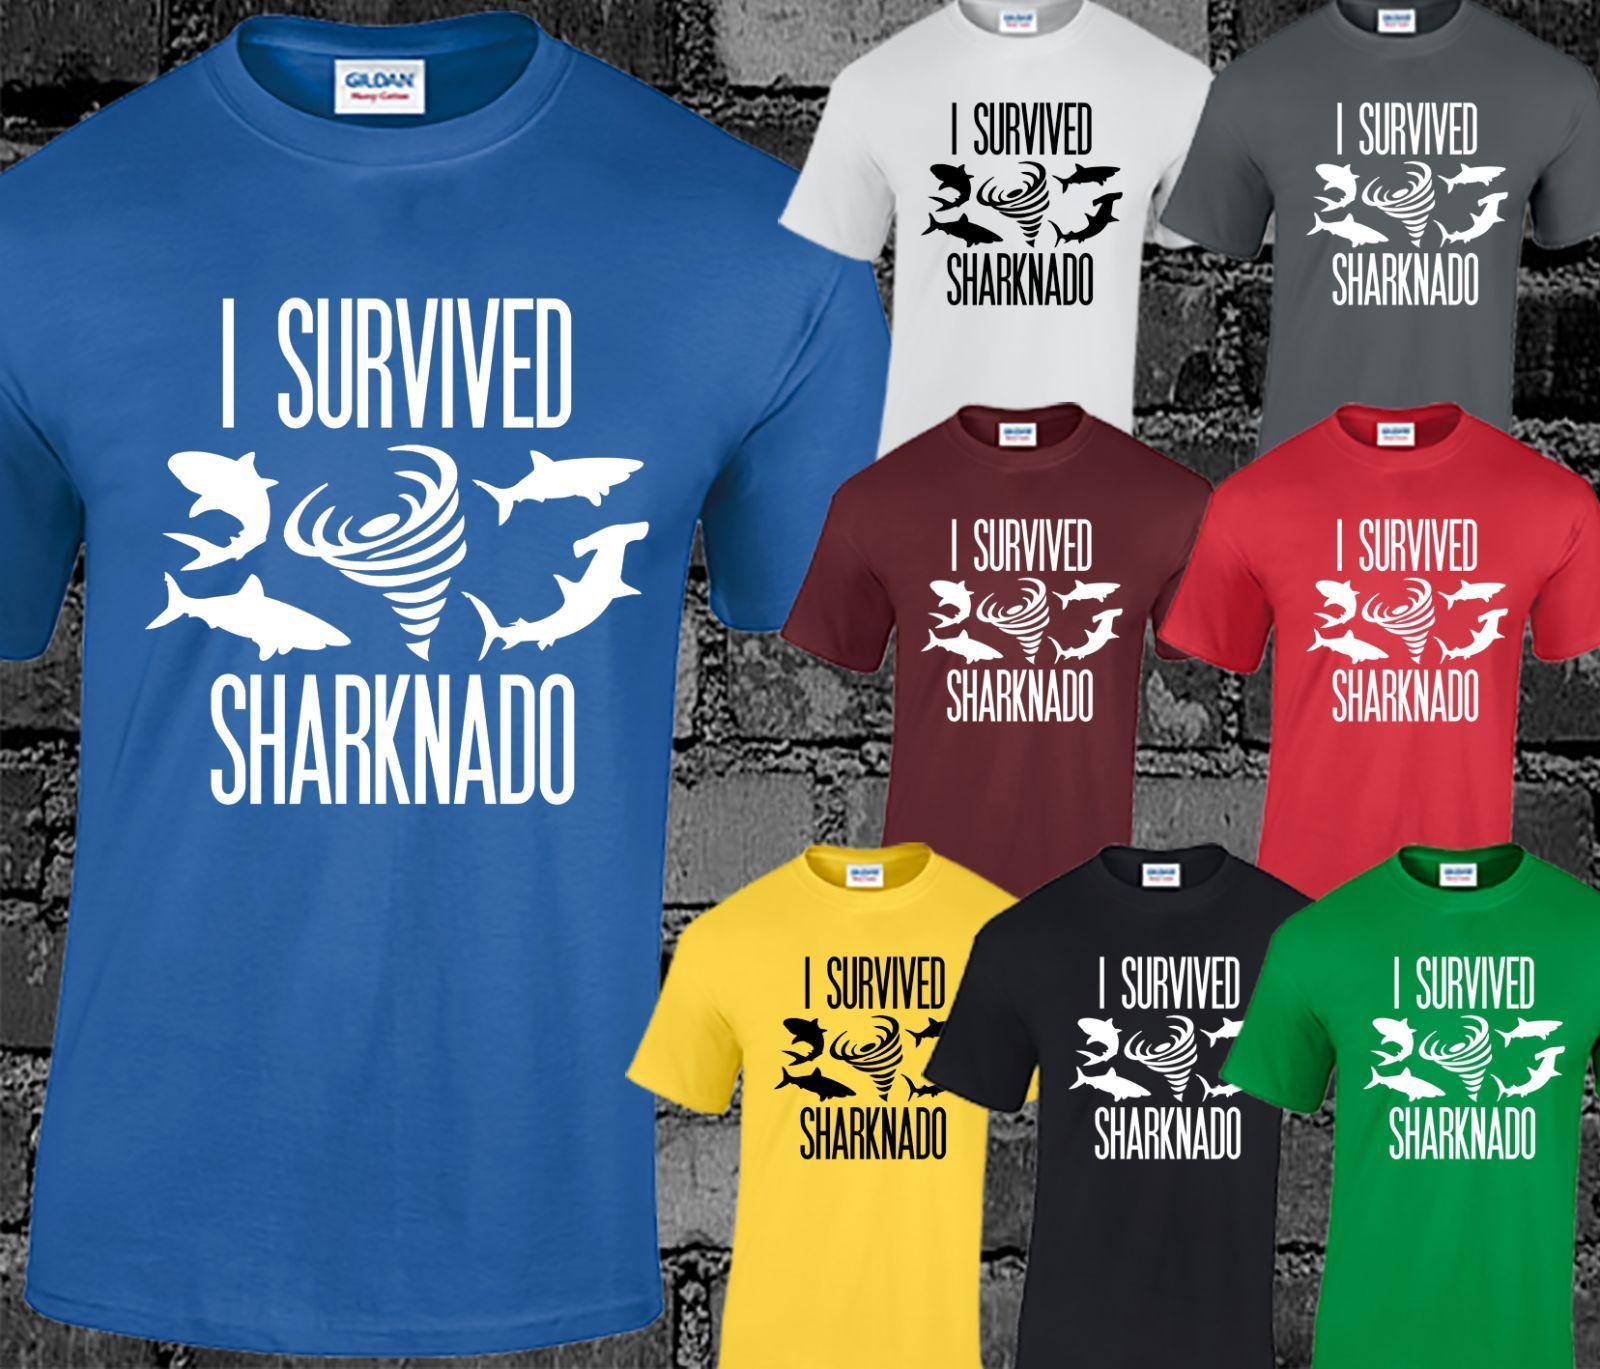 e3acfc1bb4 I Survived Sharknado Mens T Shirt Movie Film Cult Sci Fi Funny Gift Present  Cool Cool Casual Pride T Shirt Men Unisex New Fashion Designer White Tee  Shirts ...